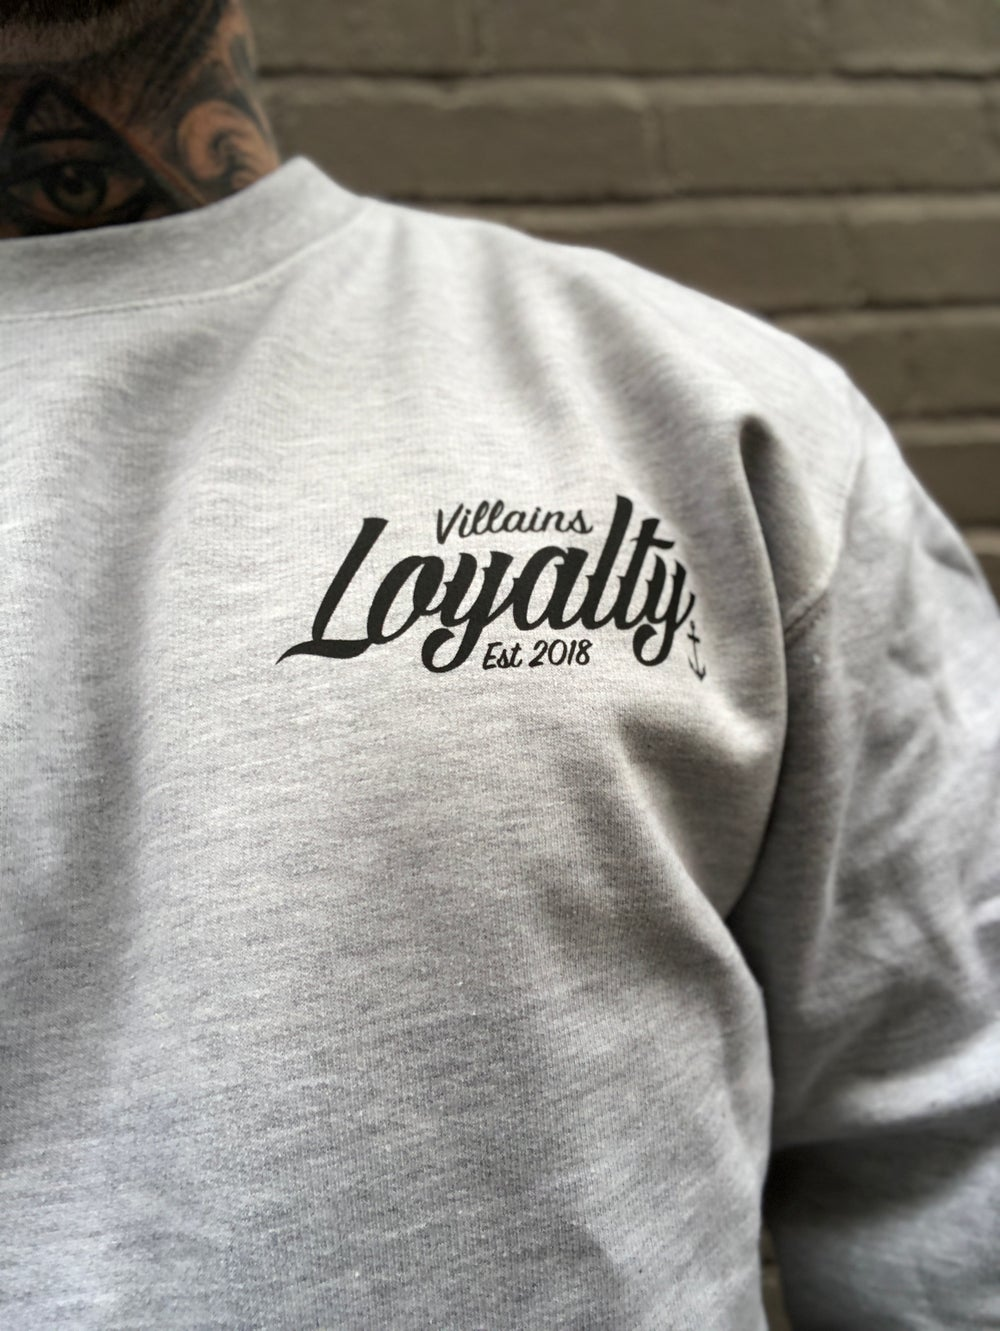 Villains Loyalty crewneck sweatshirt